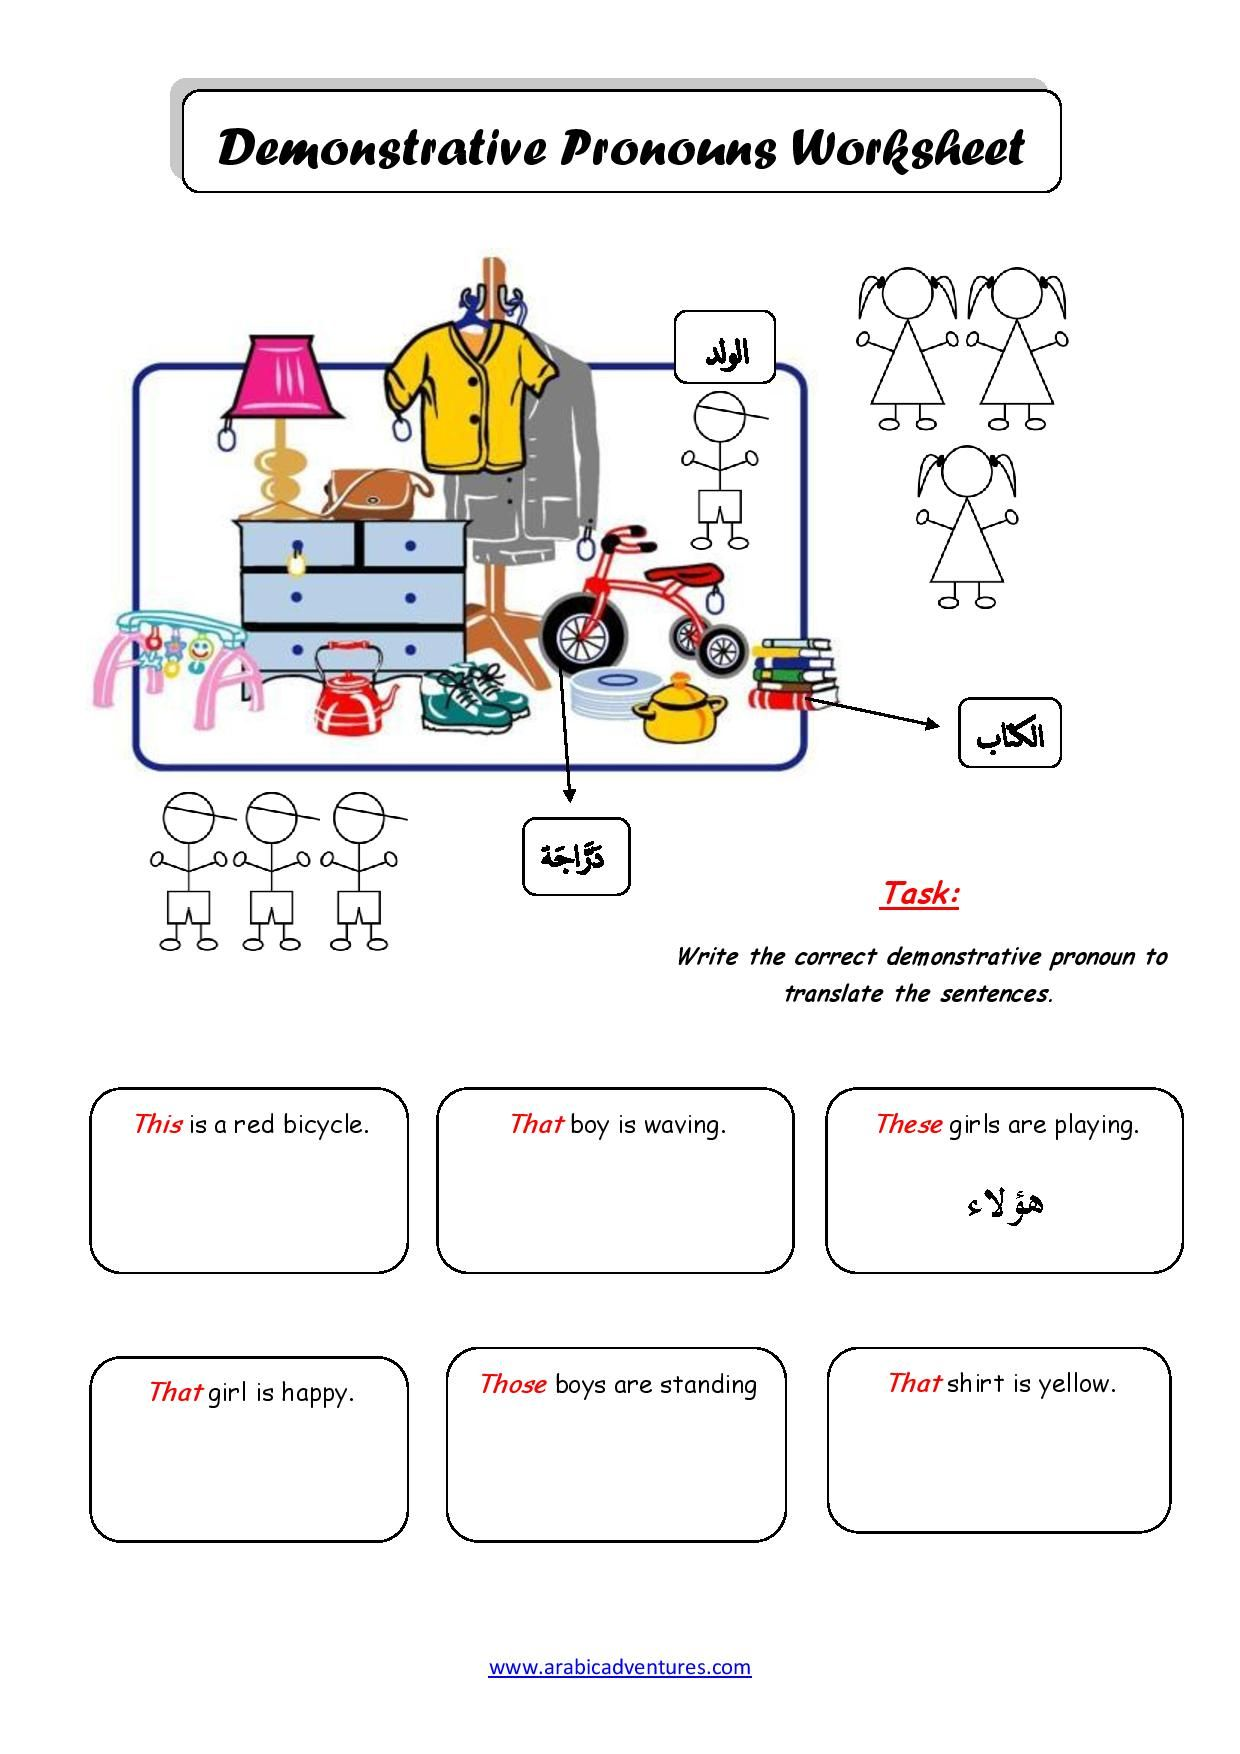 small resolution of Arabic Demonstrative pronoun worksheet. Free printable at  www.arabicadventures.com   Pronoun worksheets